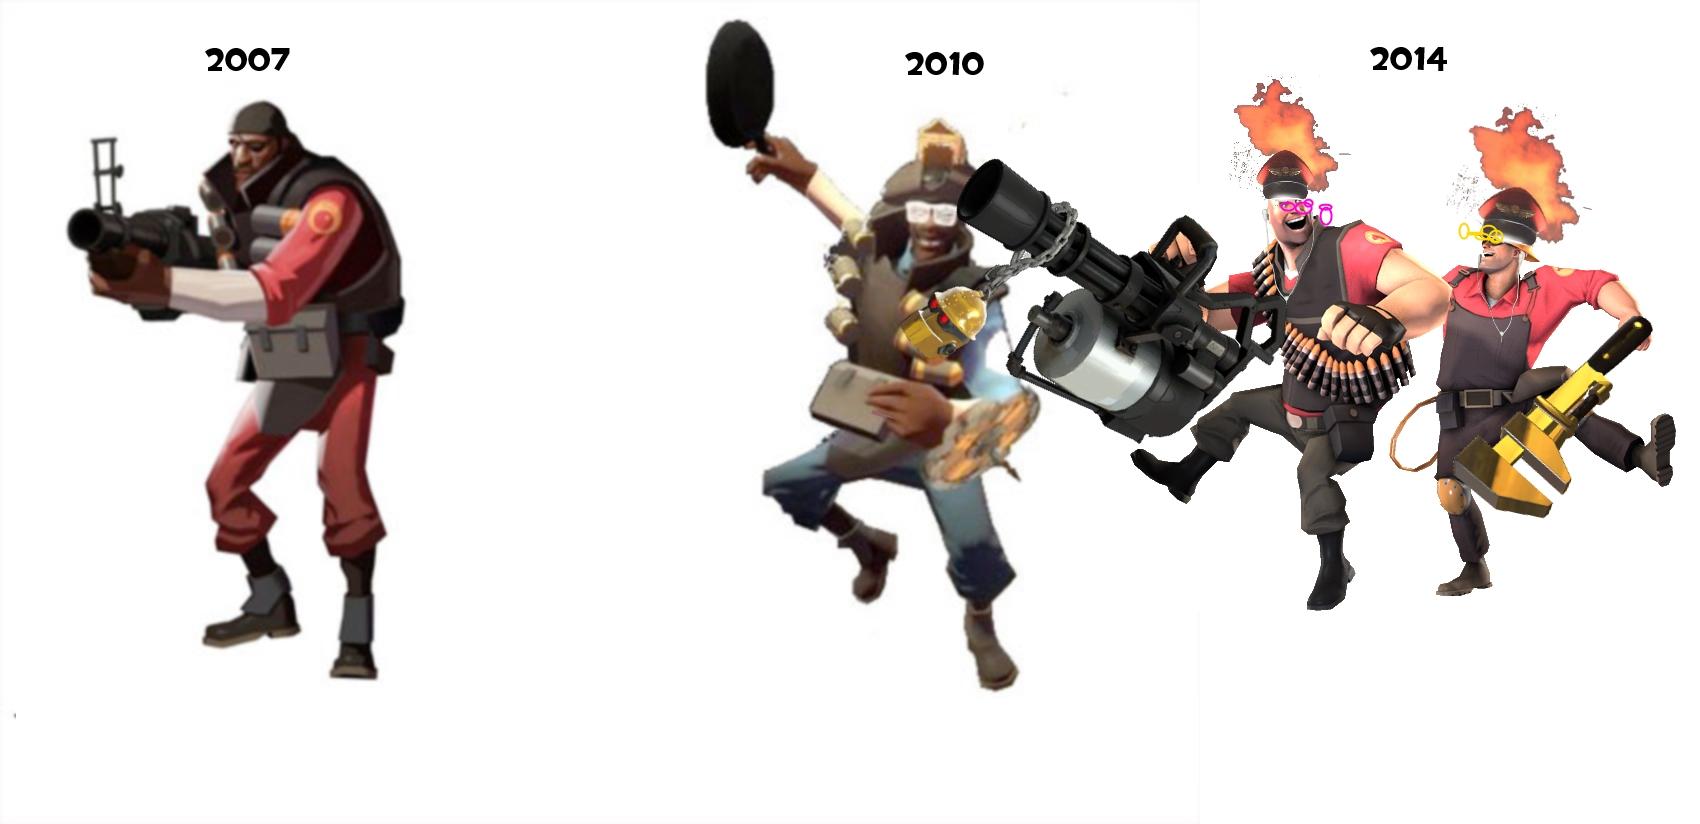 2007 2010 2014 Team Fortress 2 Dota Classic Overwatch Quake The Elder Scrolls